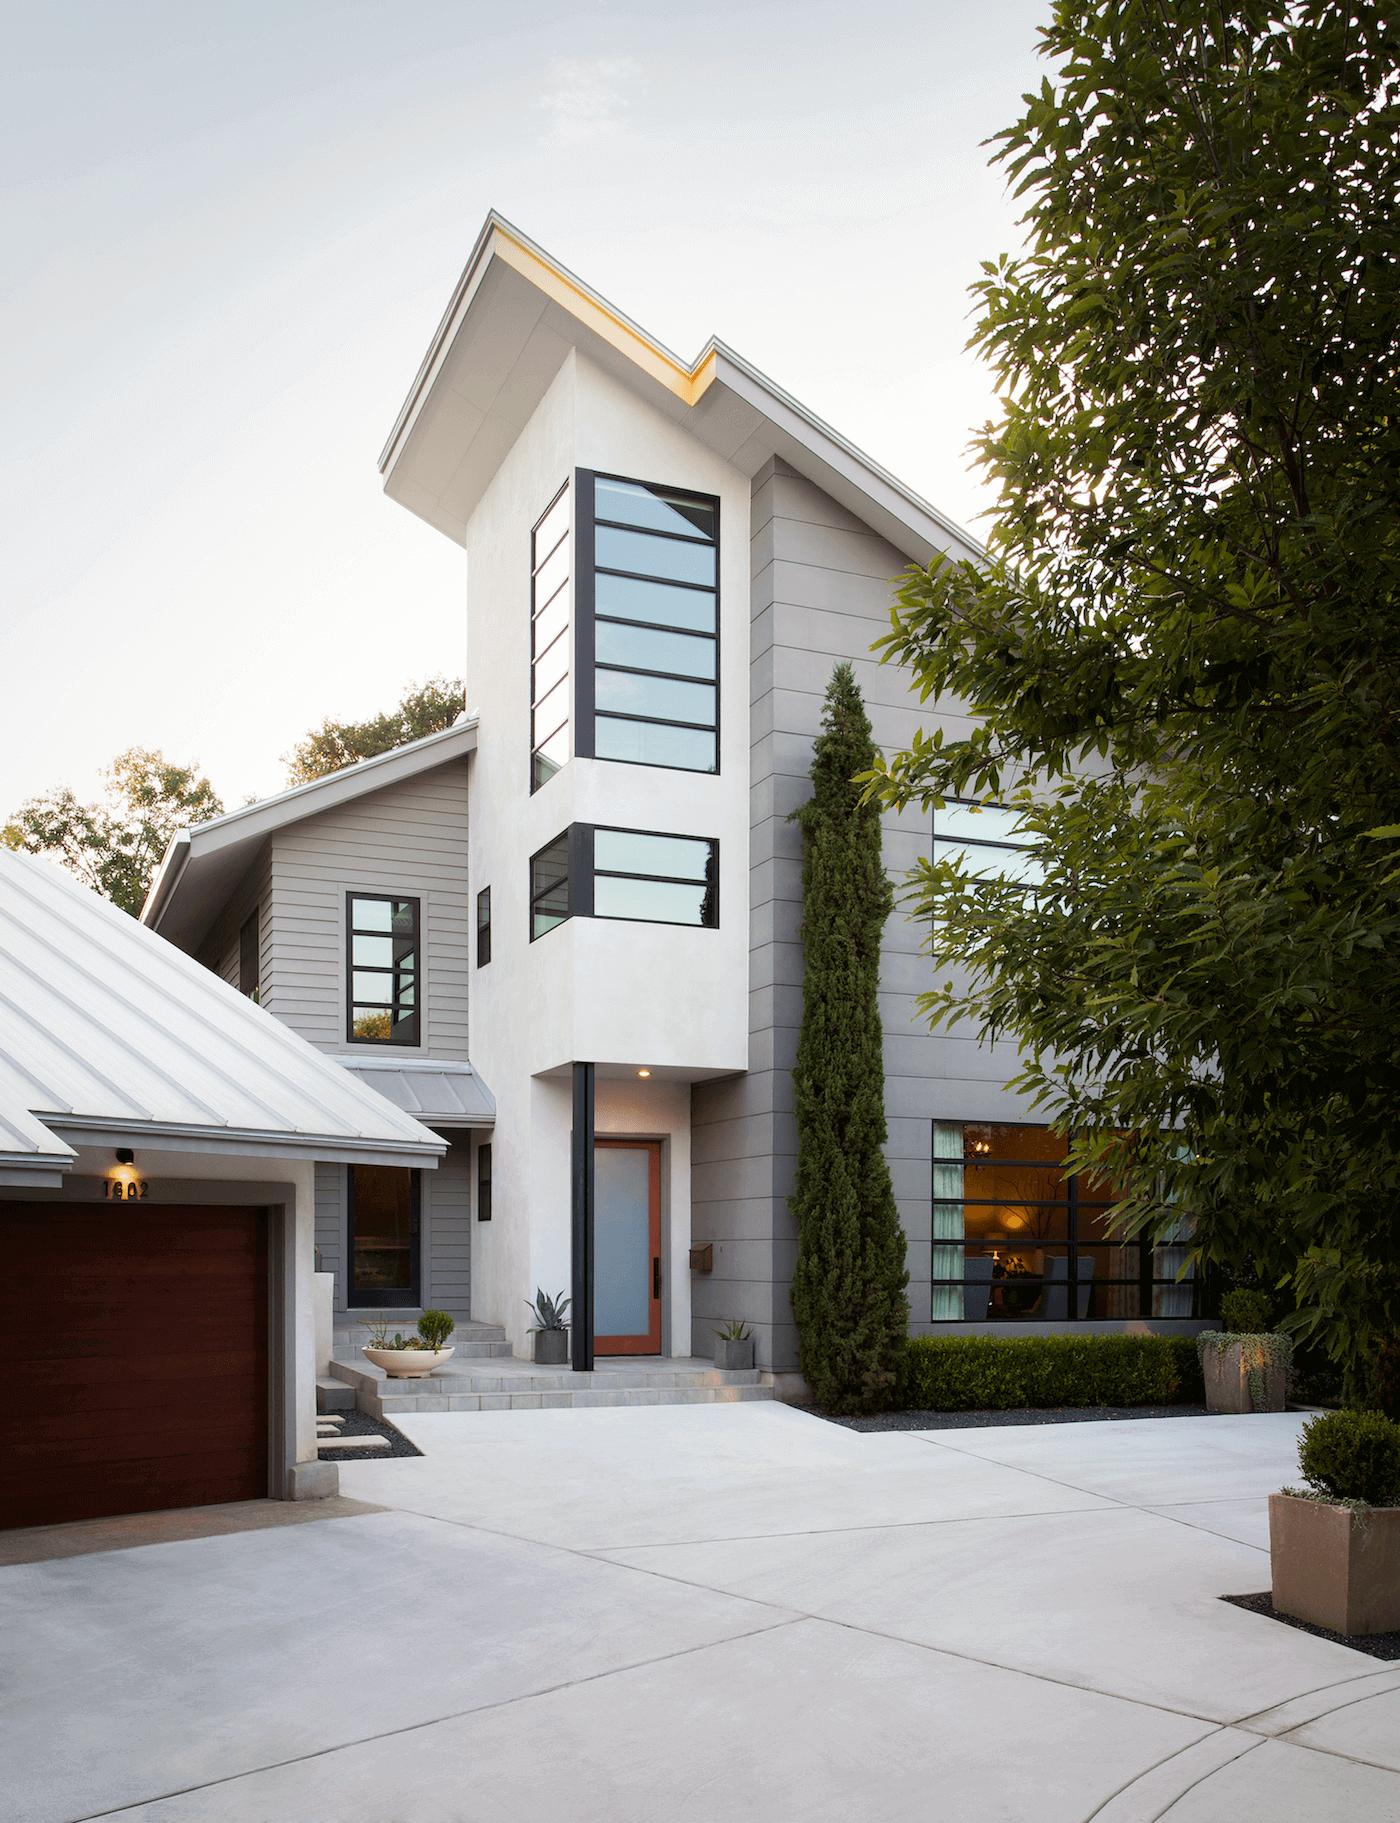 Tarrytown Exterior Front Entry | Robin Colton Interior Design Studio Austin Texas | www.robincolton.com